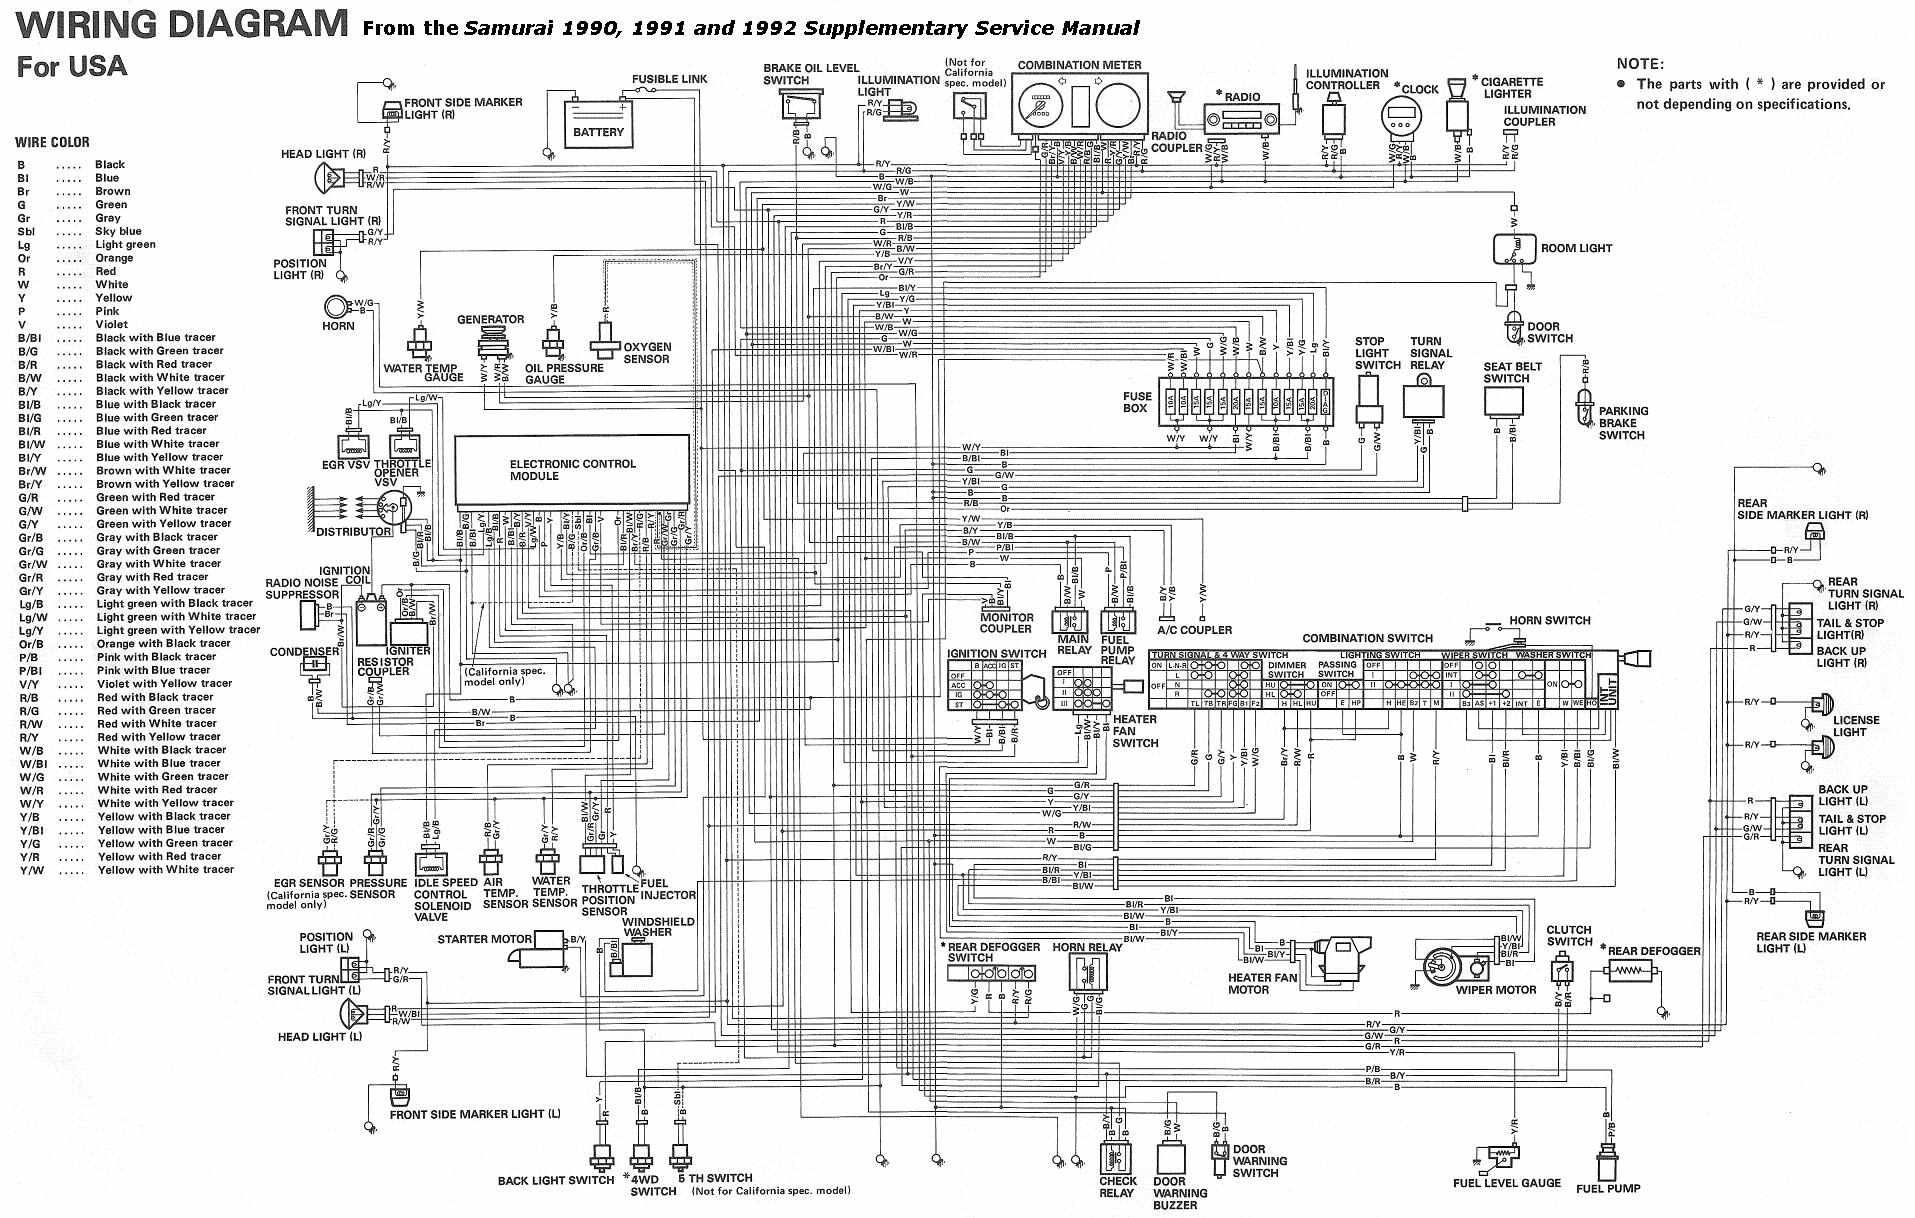 53 Suzuki Pdf Manuals Download For Free Sar Pdf Manual Wiring Diagram Fault Codes Electrical Wiring Diagram Electrical Wiring Diagram